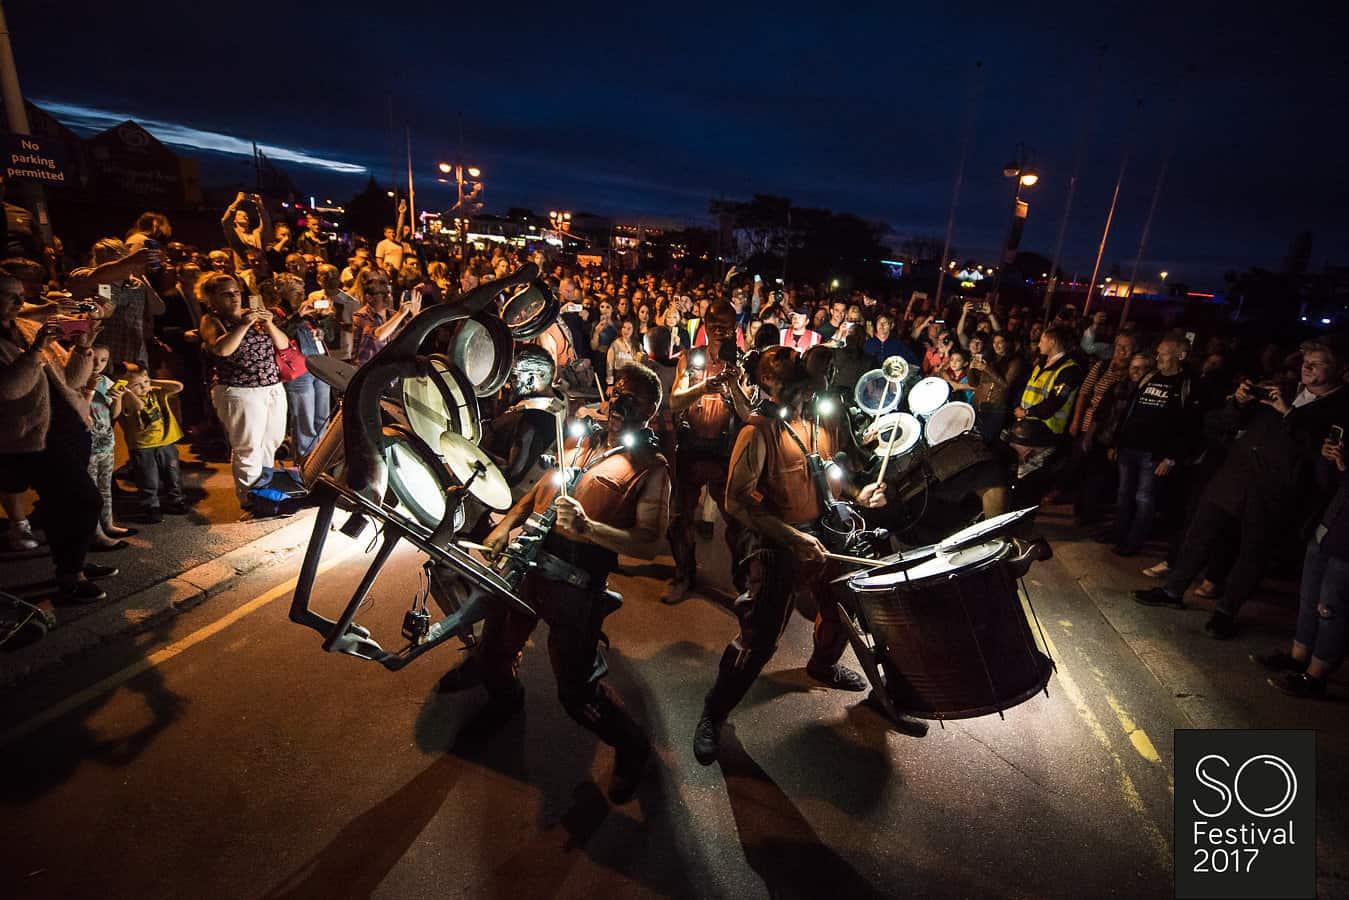 Clash of Drums - Les Commandos Percu & Deabru Beltak SO Festival 2017